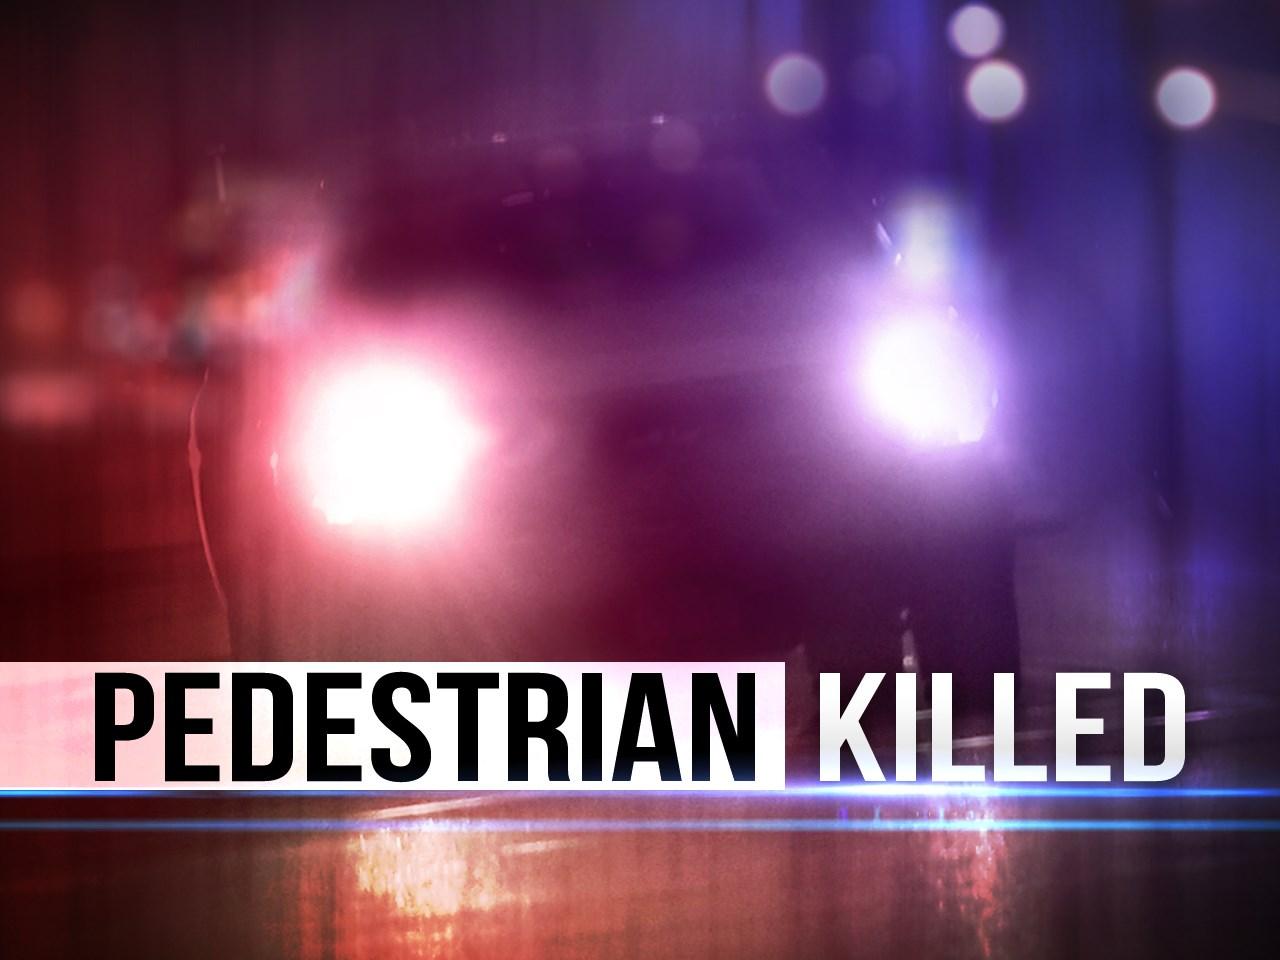 pedestrian killed_1504210924361.jpg